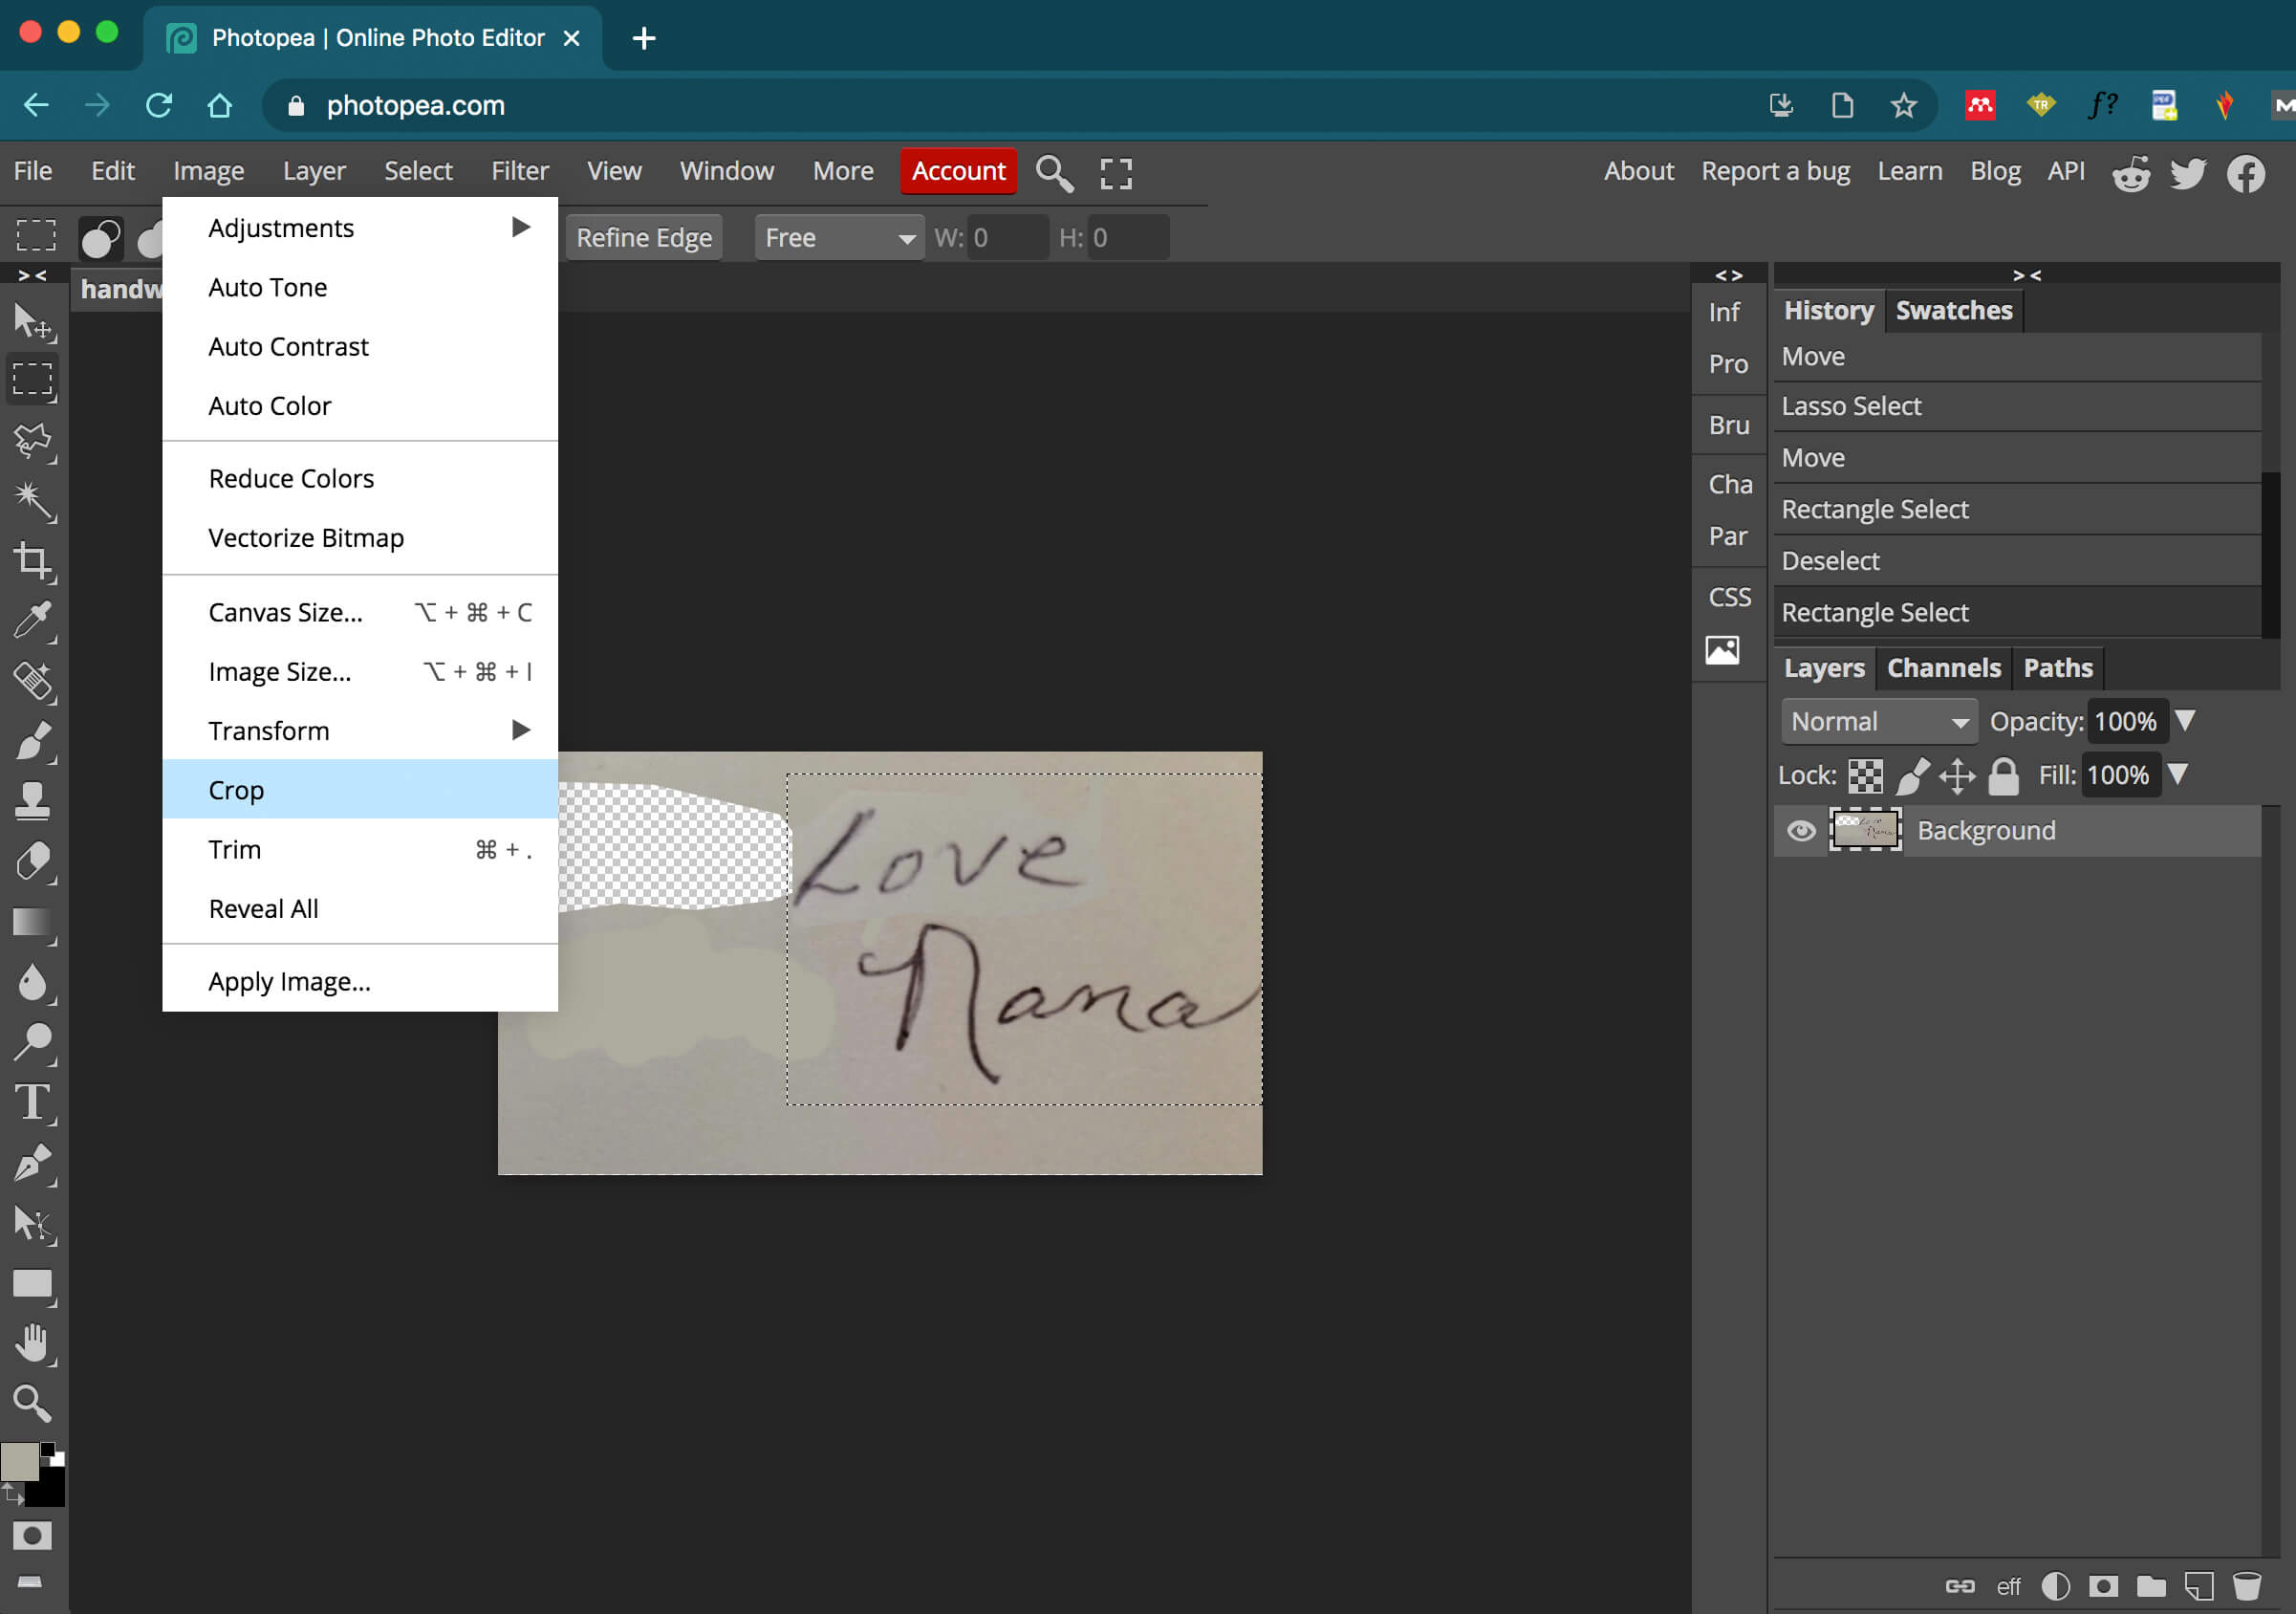 photopea - erase parts of handwriting image